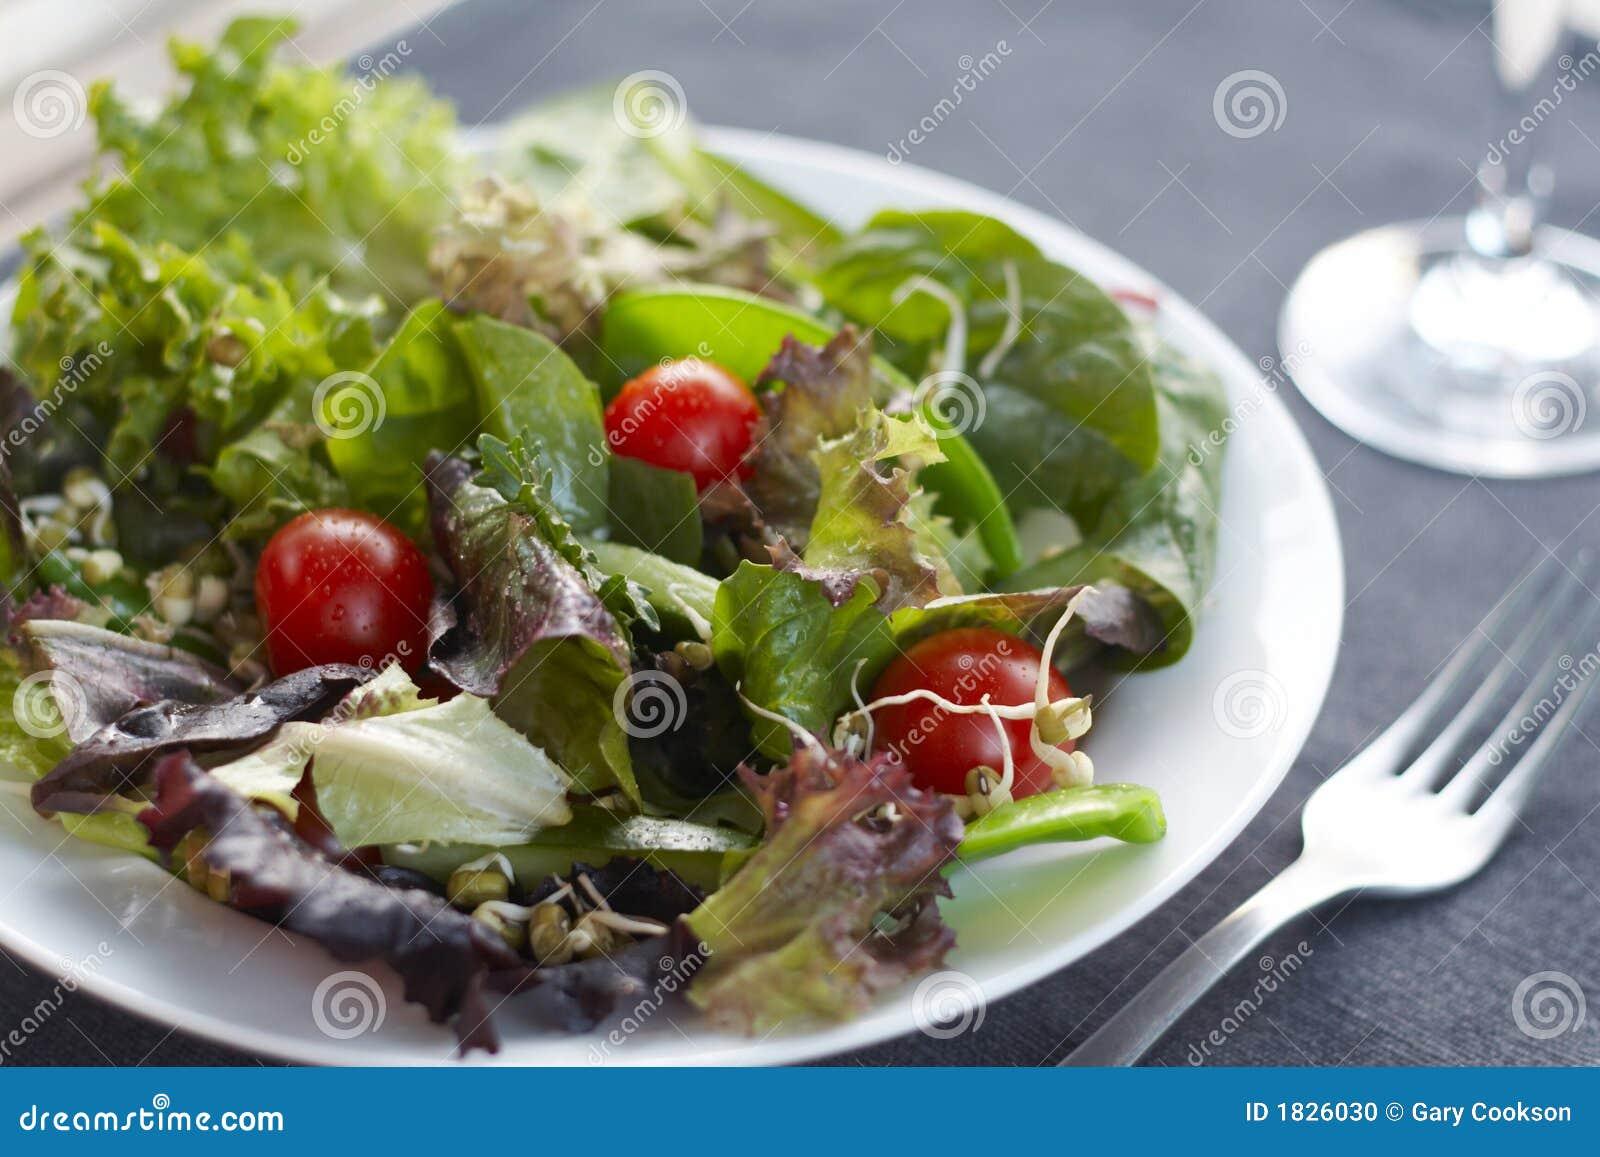 Healthy Lunch Crisp Fresh Salad Stock Photo Image 1826030 : healthy lunch crisp fresh salad 1826030 from www.dreamstime.com size 1300 x 957 jpeg 318kB